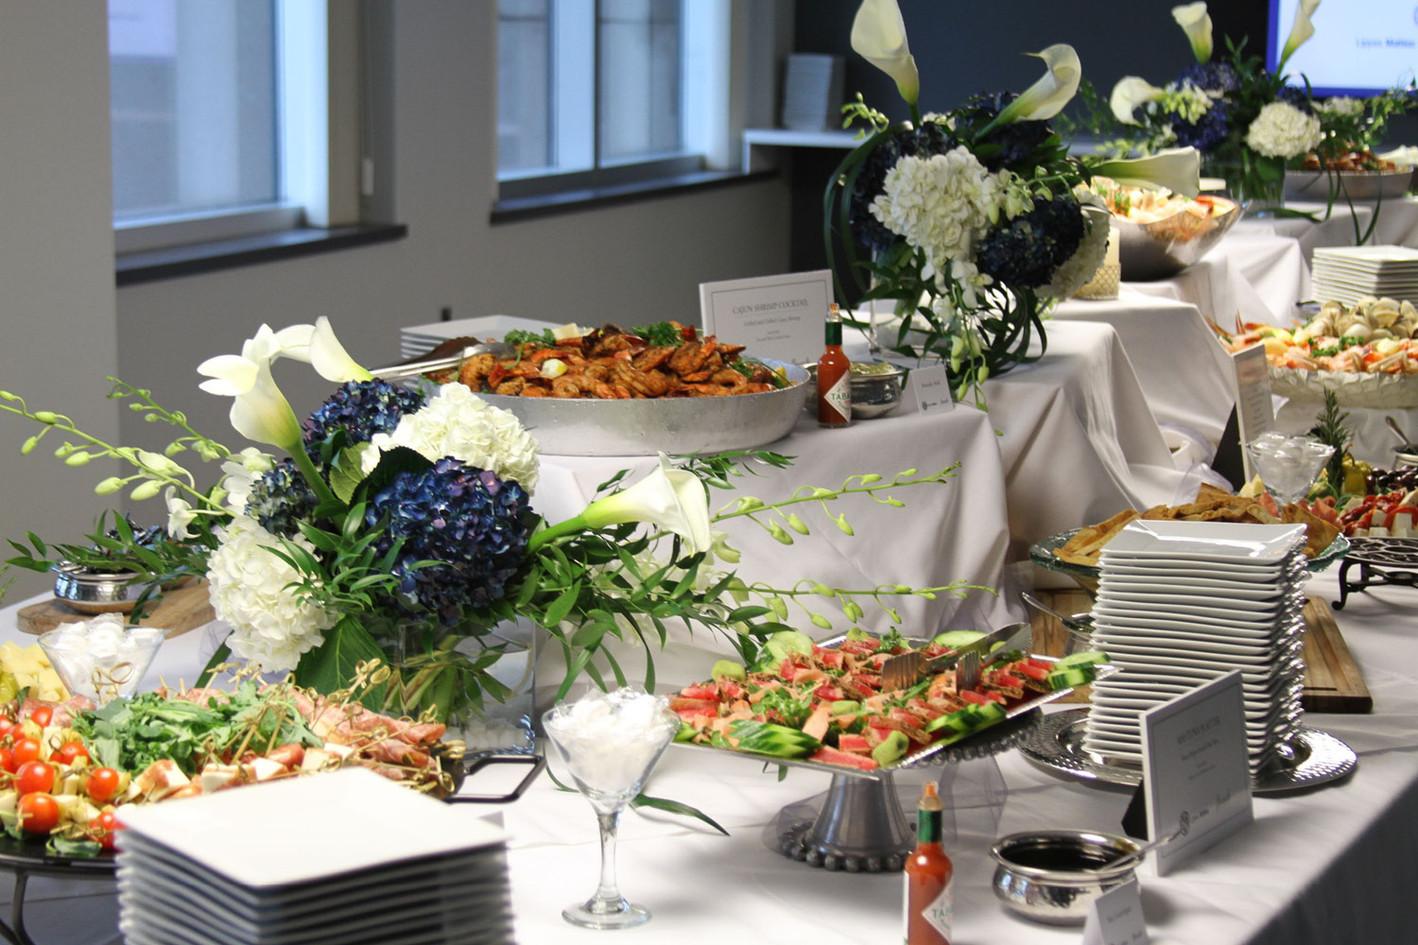 Catering Website Photos9.jpg